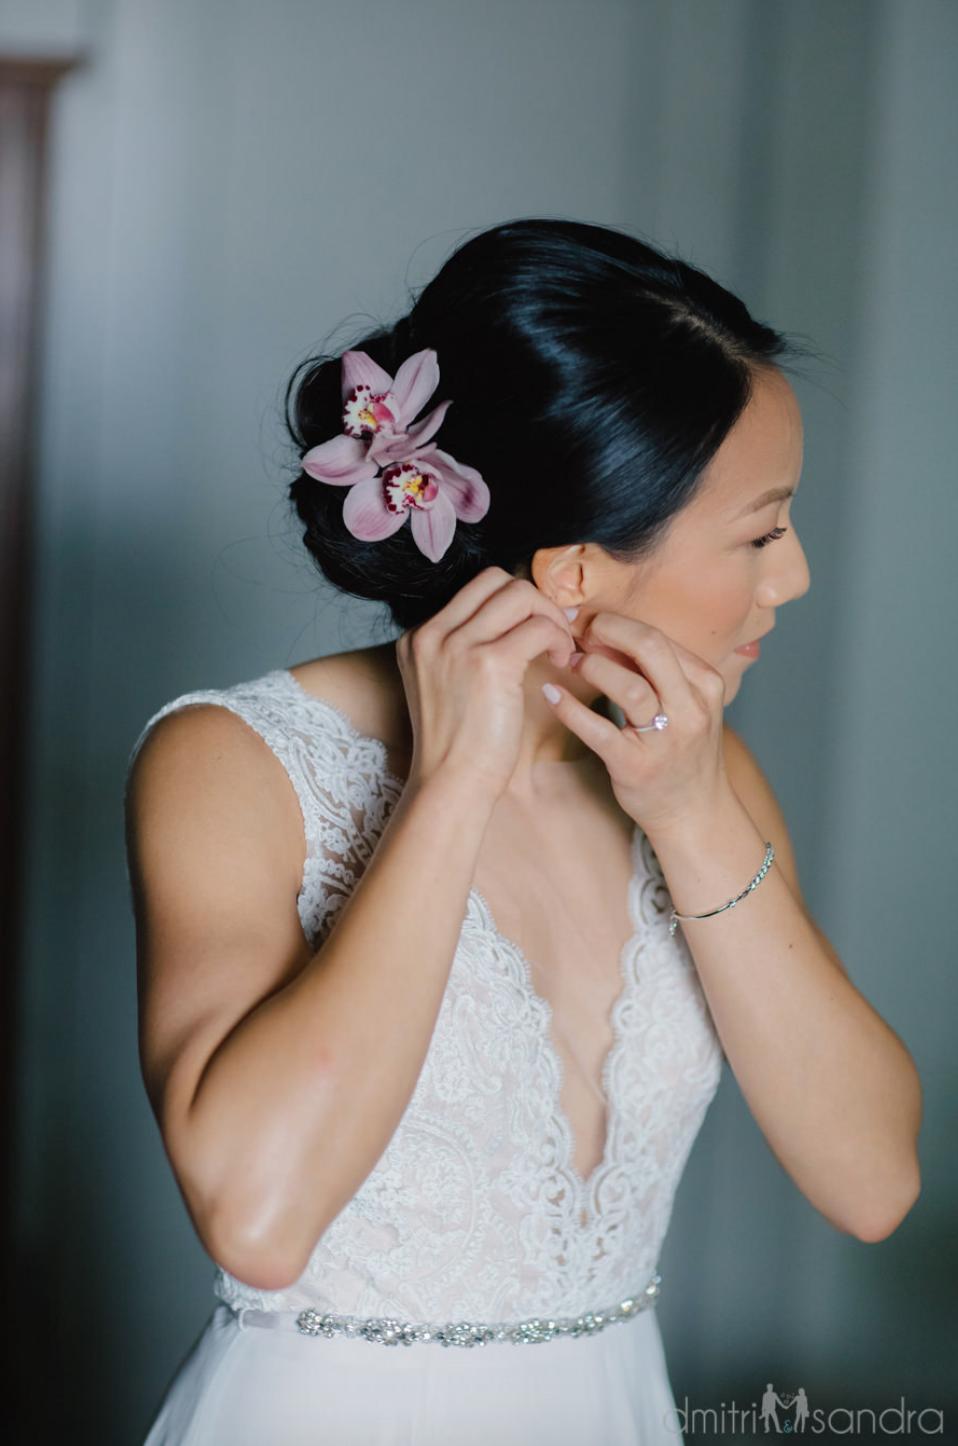 Pink Cymbidium Orchid Bridal Hair Flowers Flowers In Hair Bridal Hair Flowers Bridal Hair